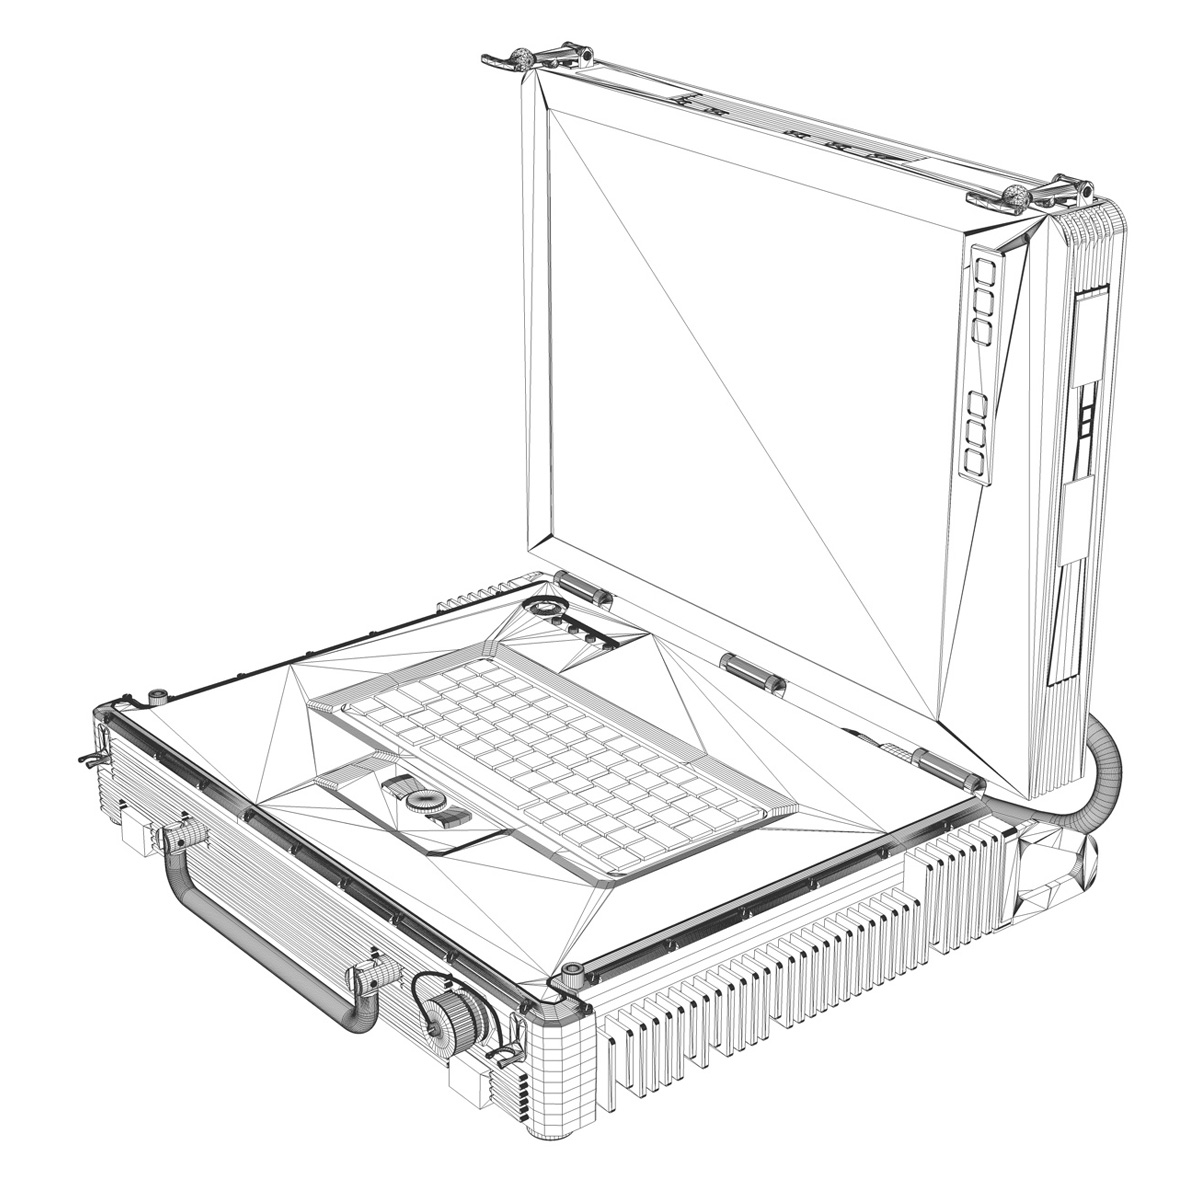 rugged military outdoor laptop 3d model 3ds fbx c4d lwo obj 189359